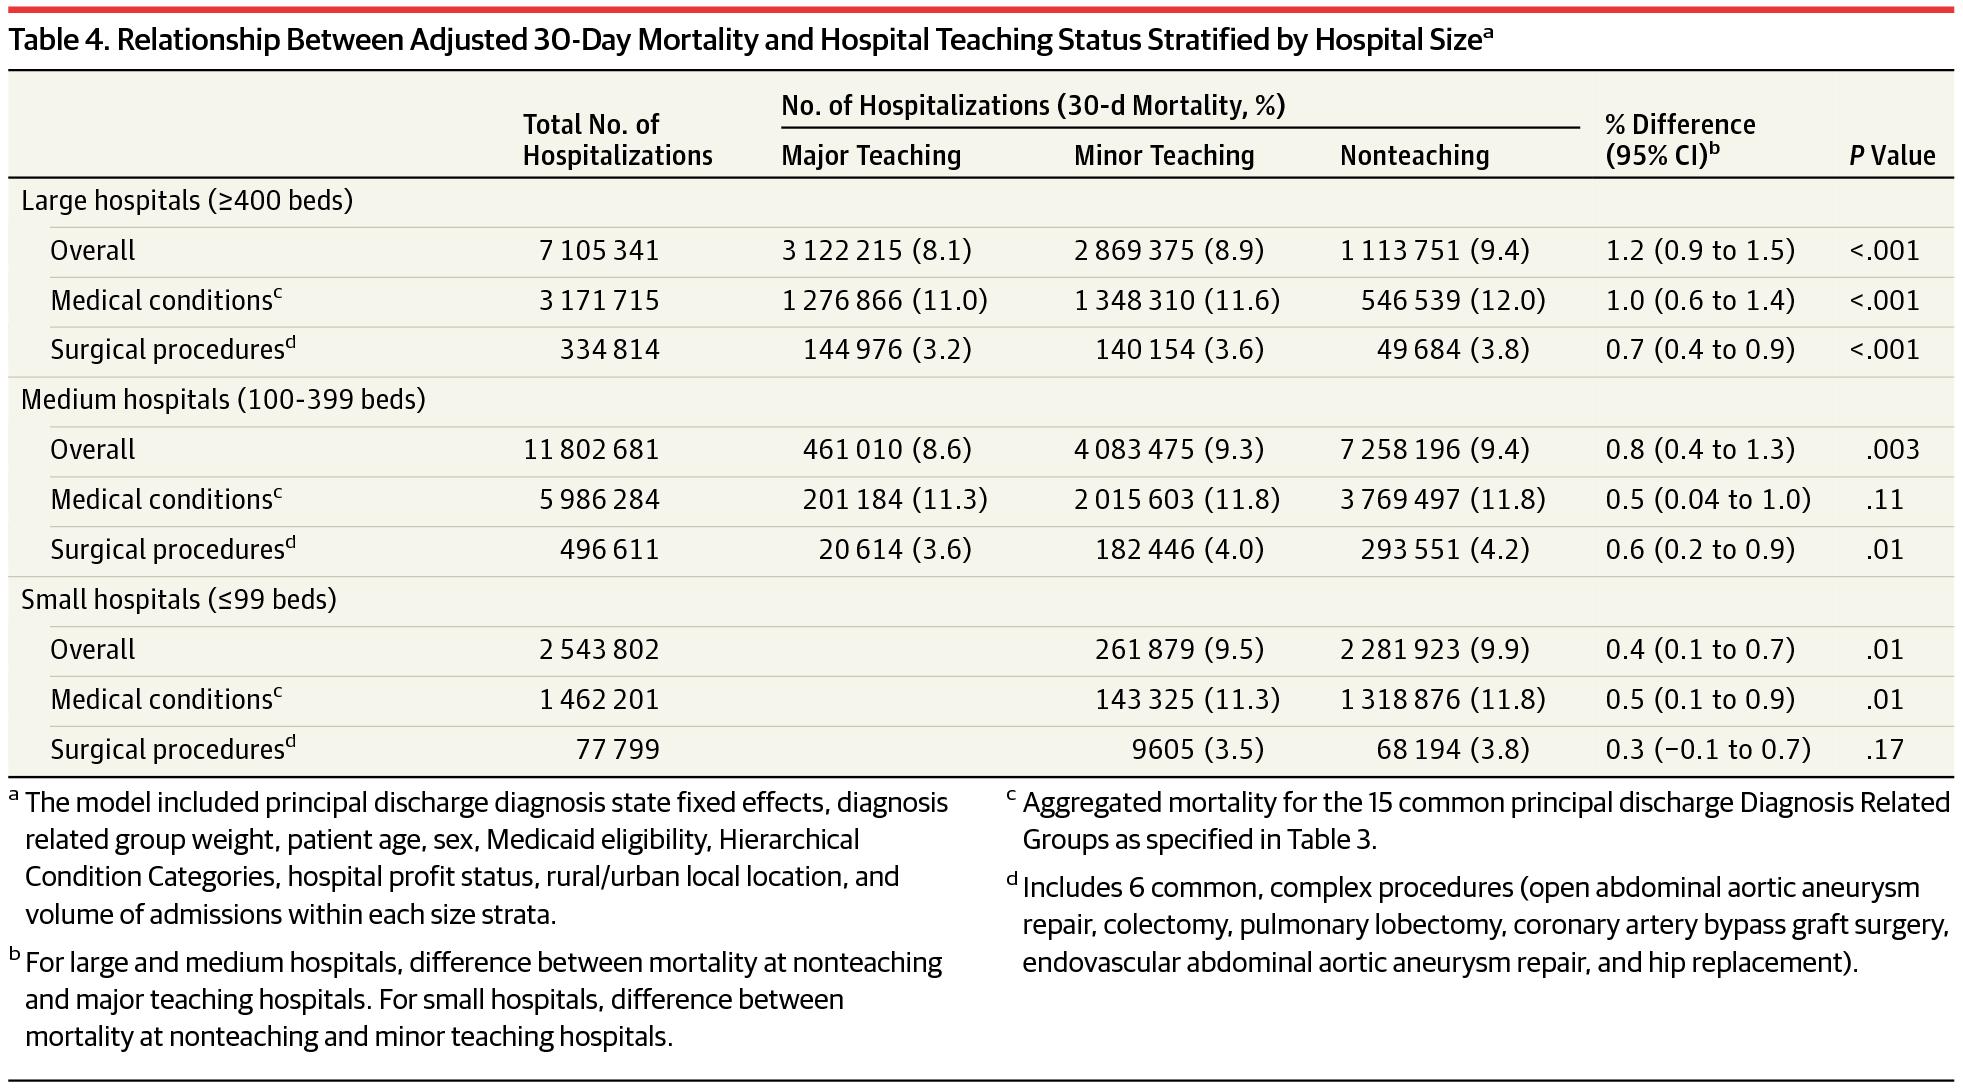 [JAMA最新论文]:美国教学医院常见疾病的病死率较低